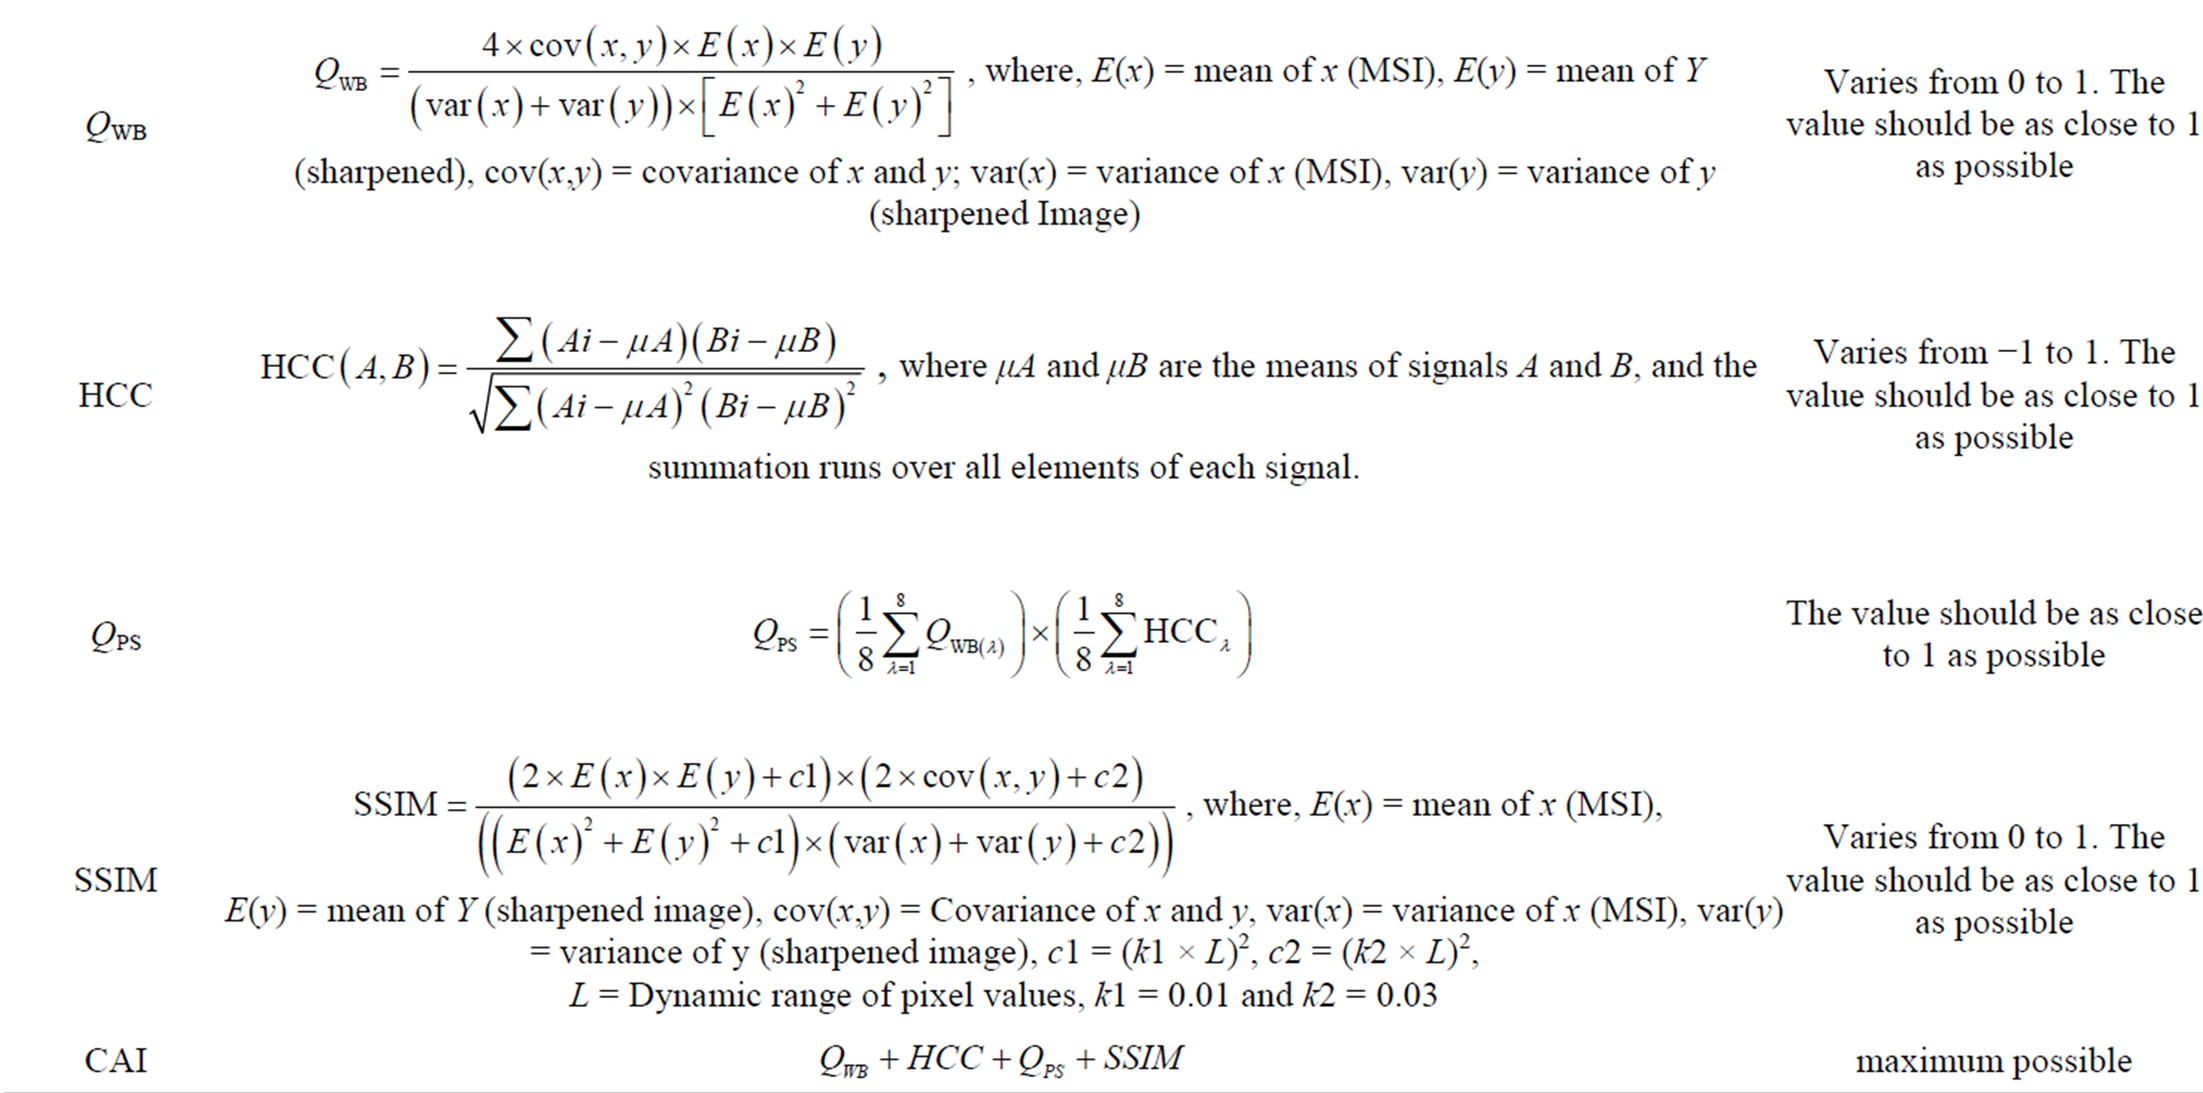 A Comprehensive Evaluation of PAN-Sharpening Algorithms